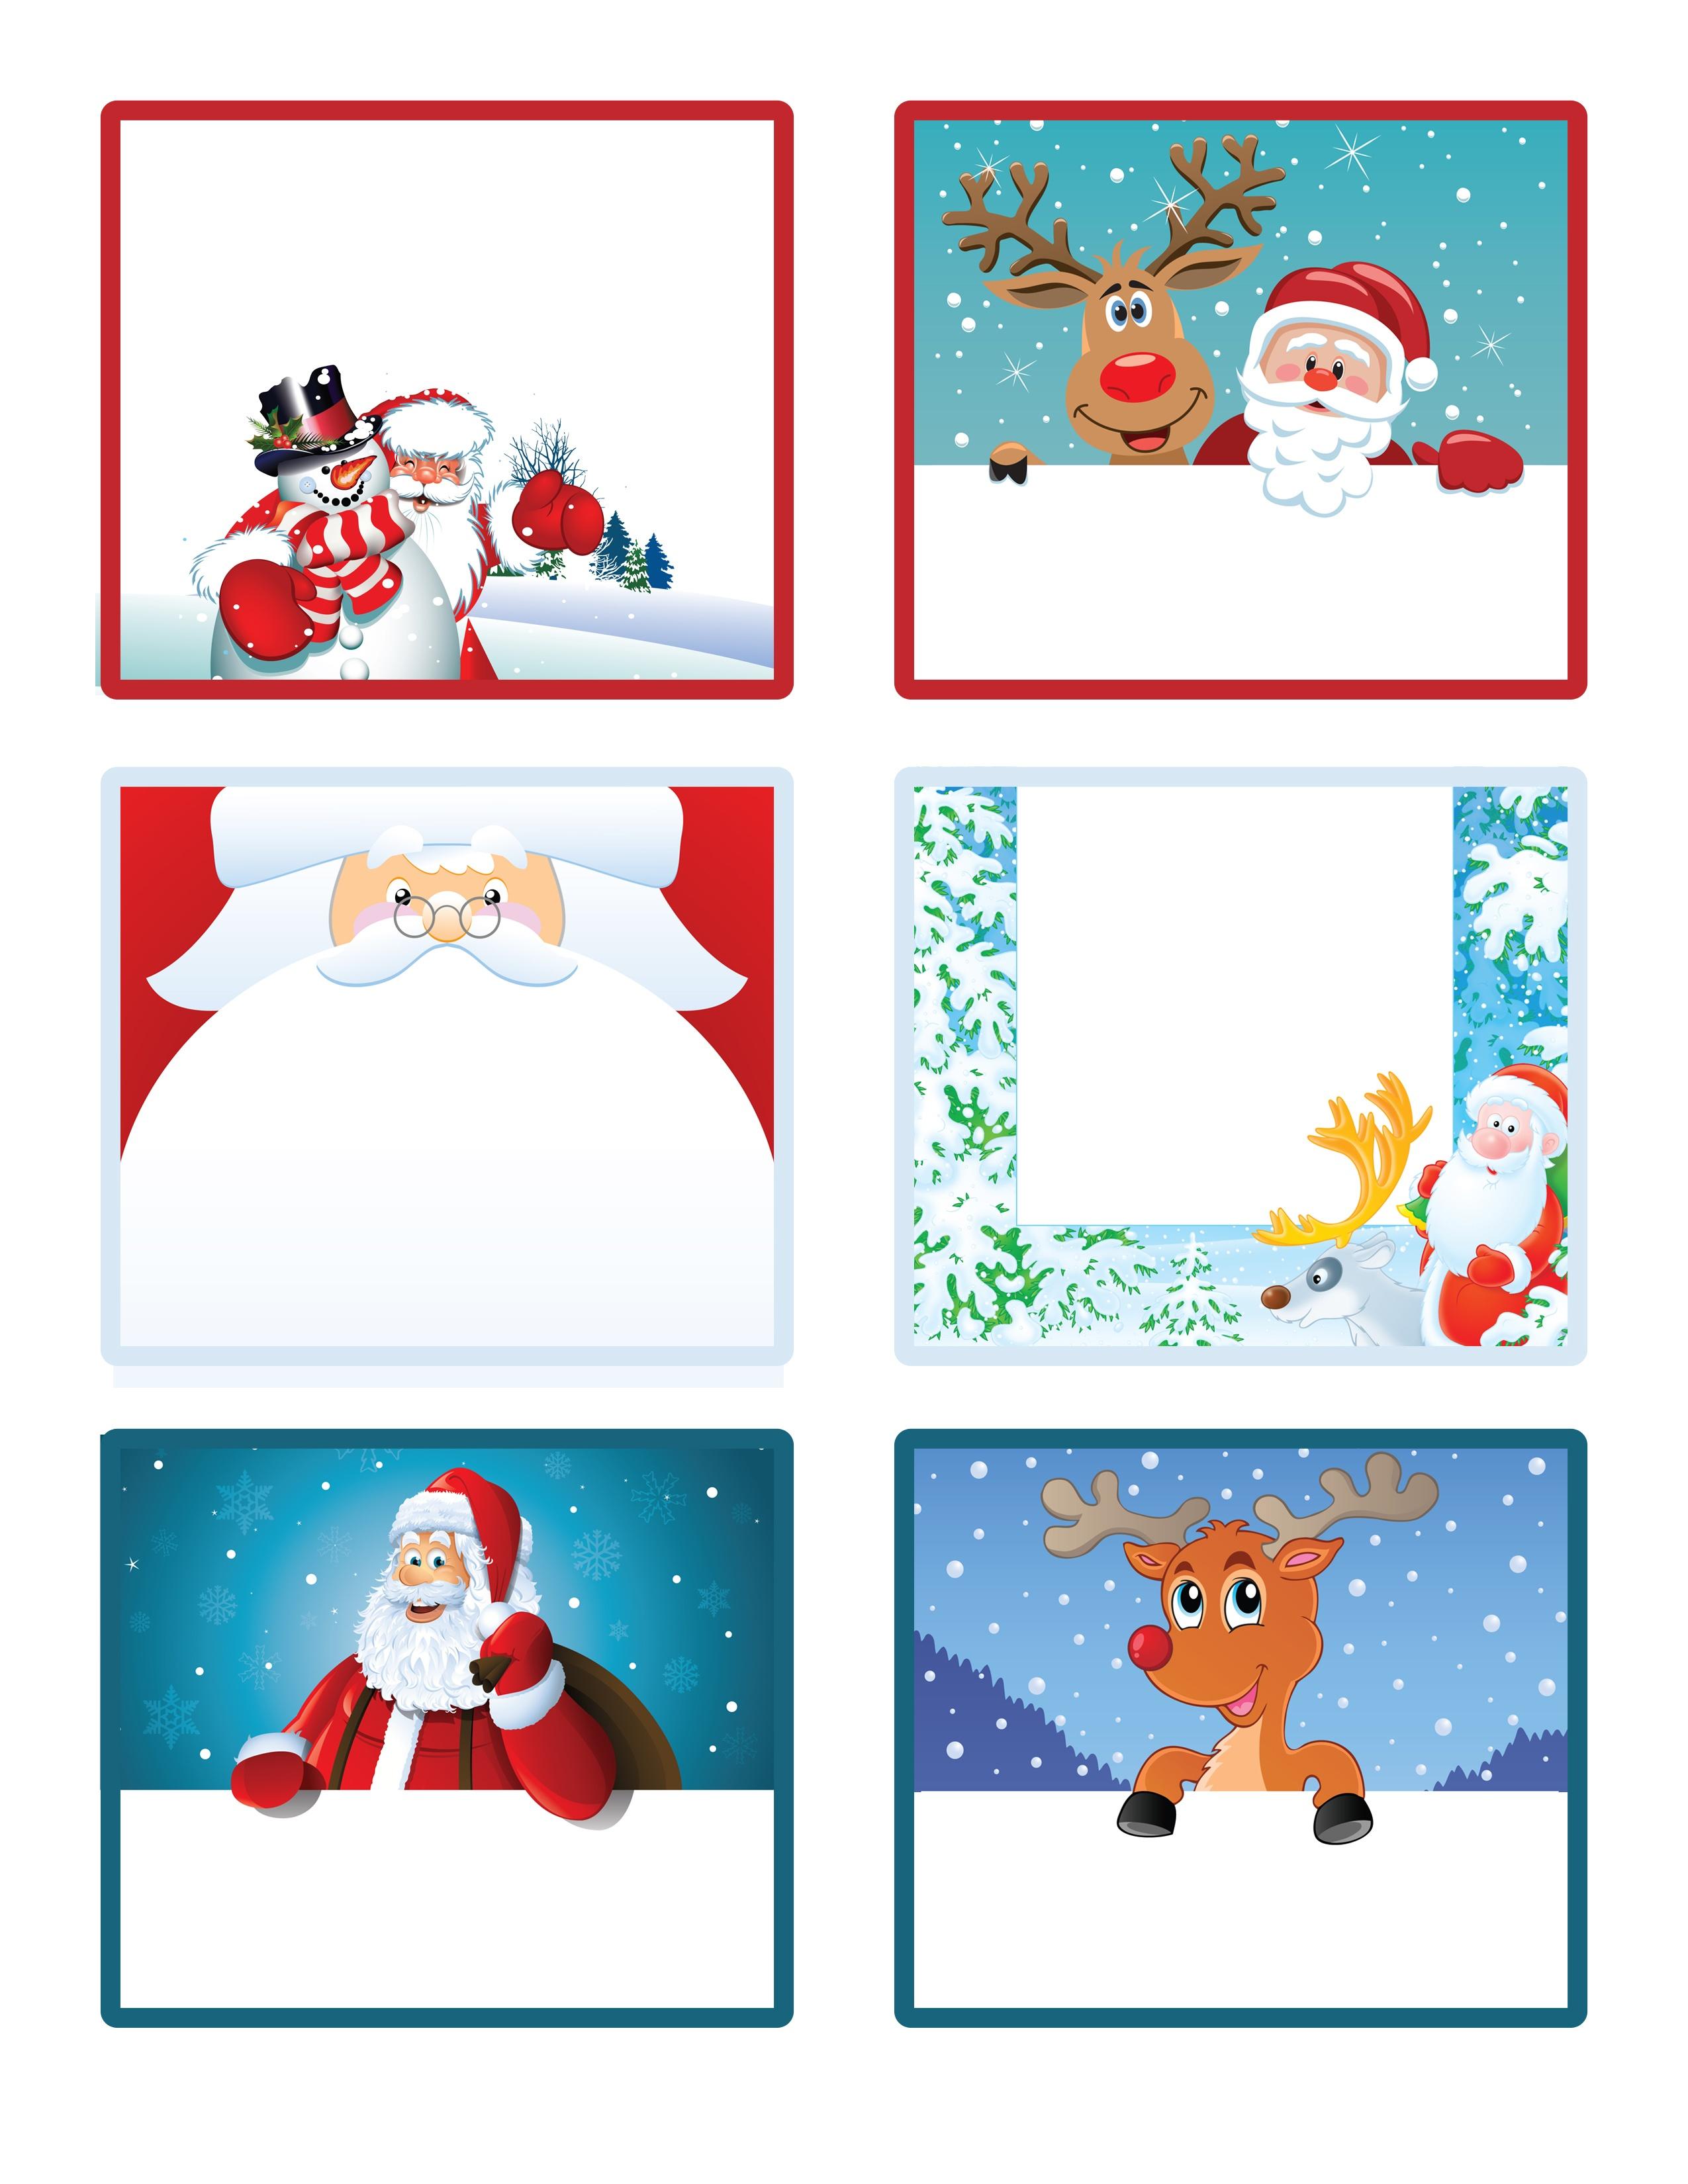 Santa's Little Gift To You! Free Printable Gift Tags And Labels - Free Printable Santa Gift Tags